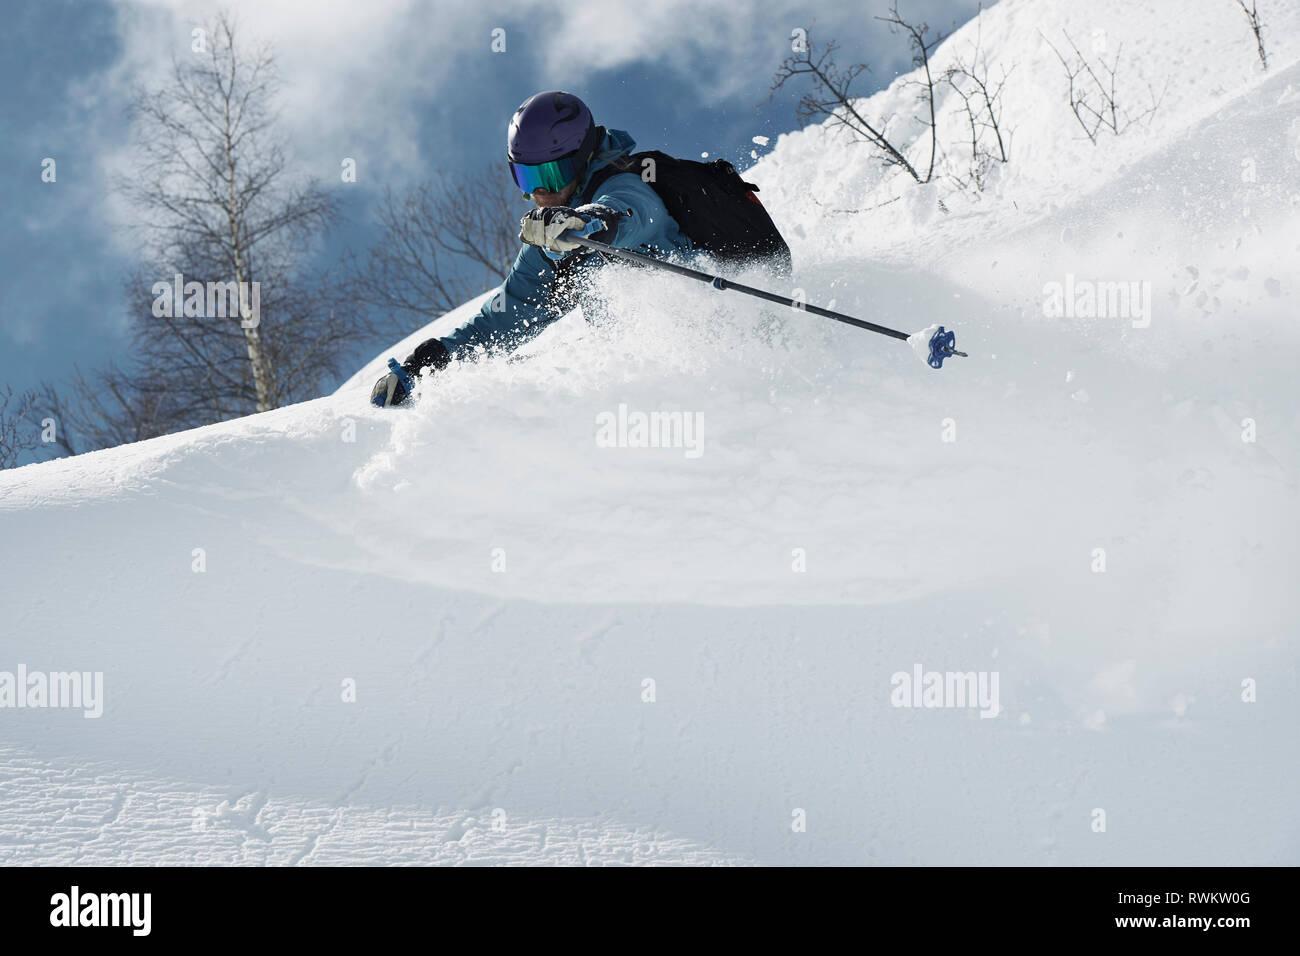 Male skier skiing on powder snow, Alpe-d'Huez, Rhone-Alpes, France - Stock Image